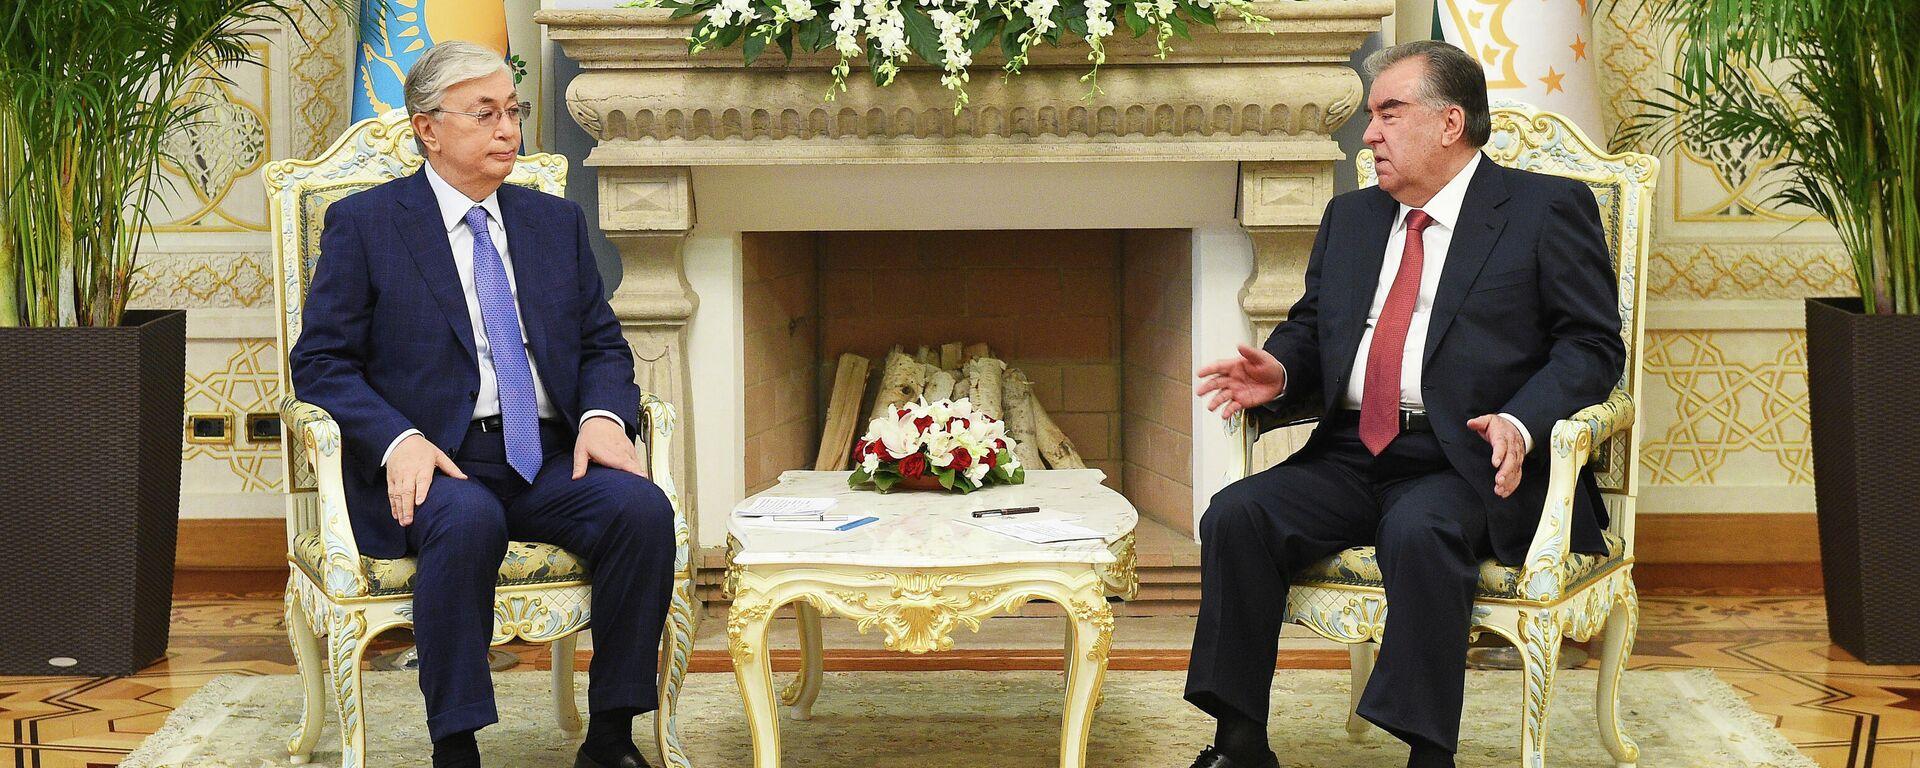 Президент Касым-Жомарт Токаев и Президент Таджикистана Эмомали Рахмон - Sputnik Тоҷикистон, 1920, 15.09.2021